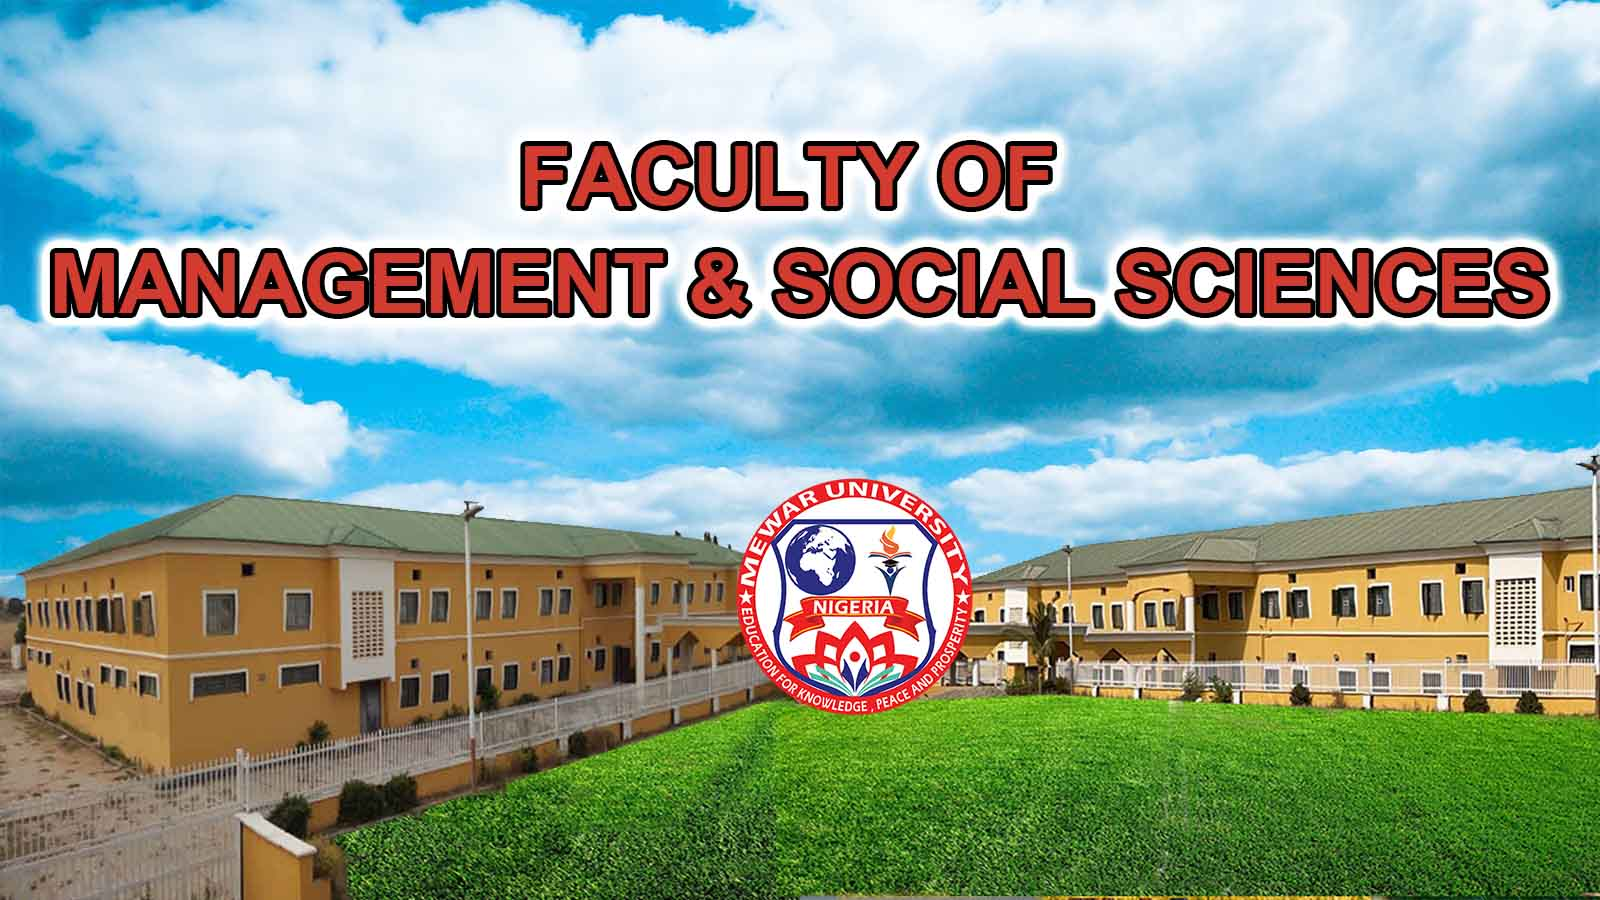 Mewar International University Nigeria Faculty of Management & Social Sciences